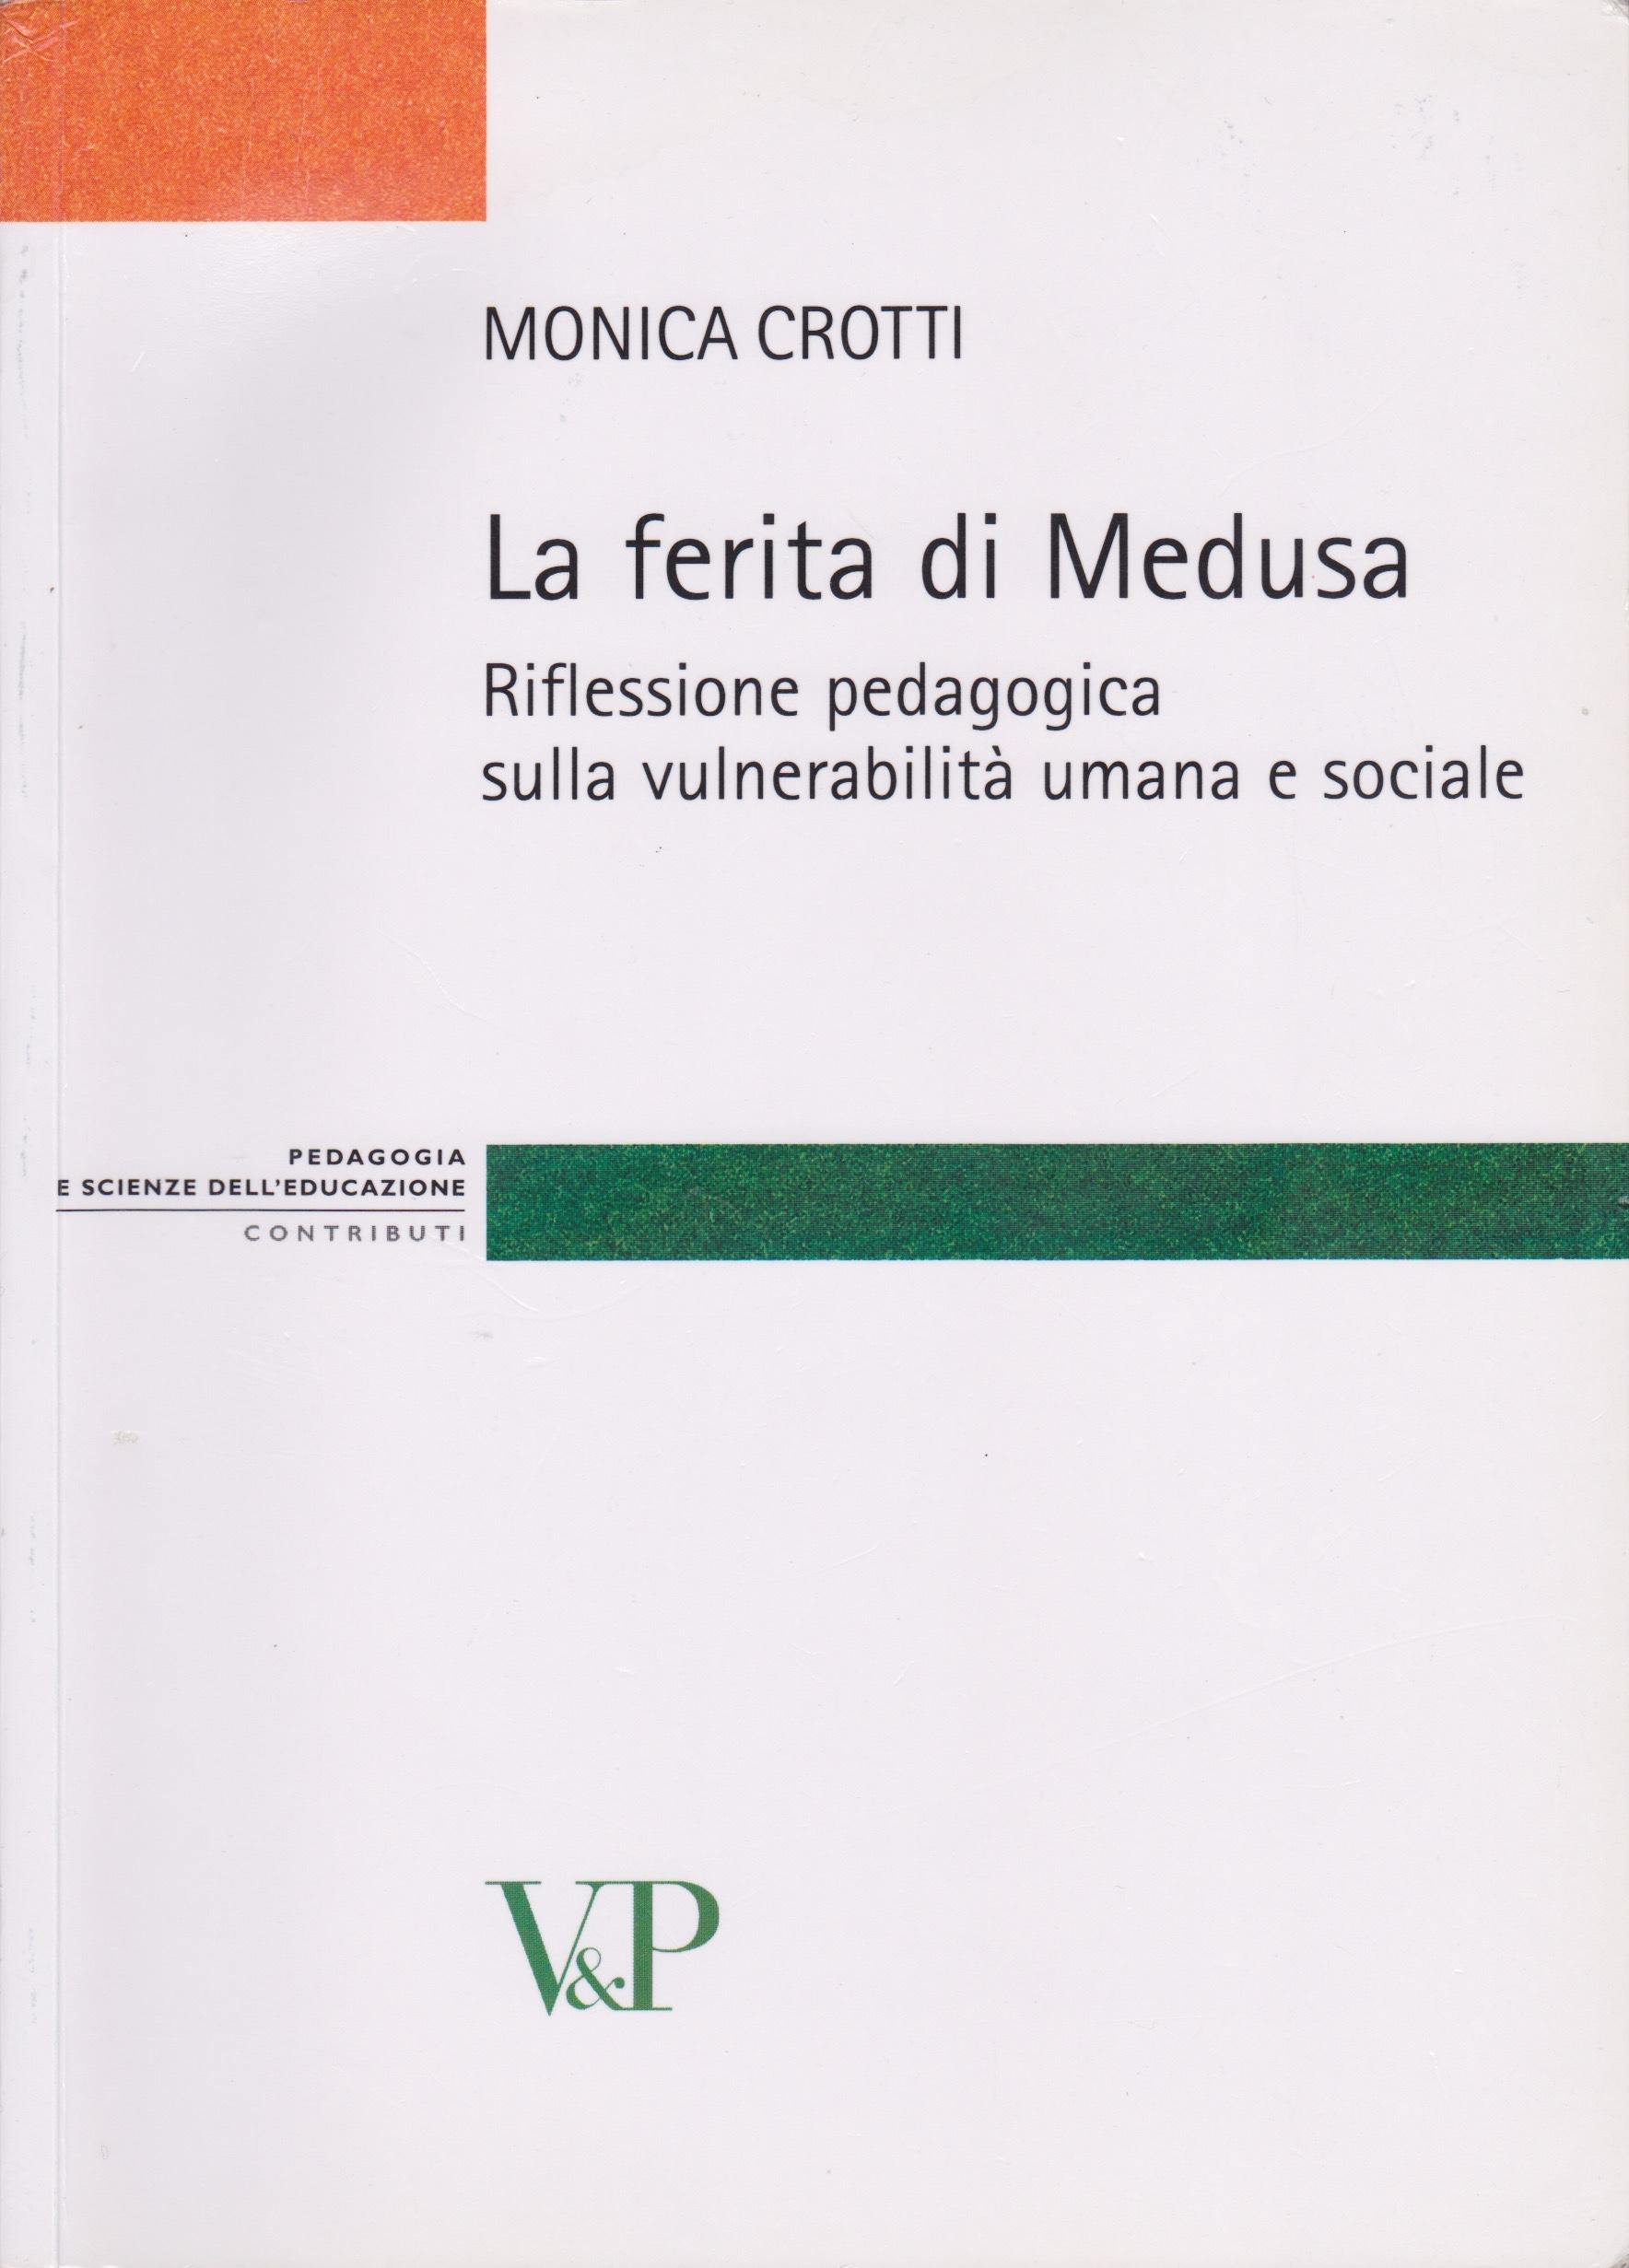 La ferita di Medusa